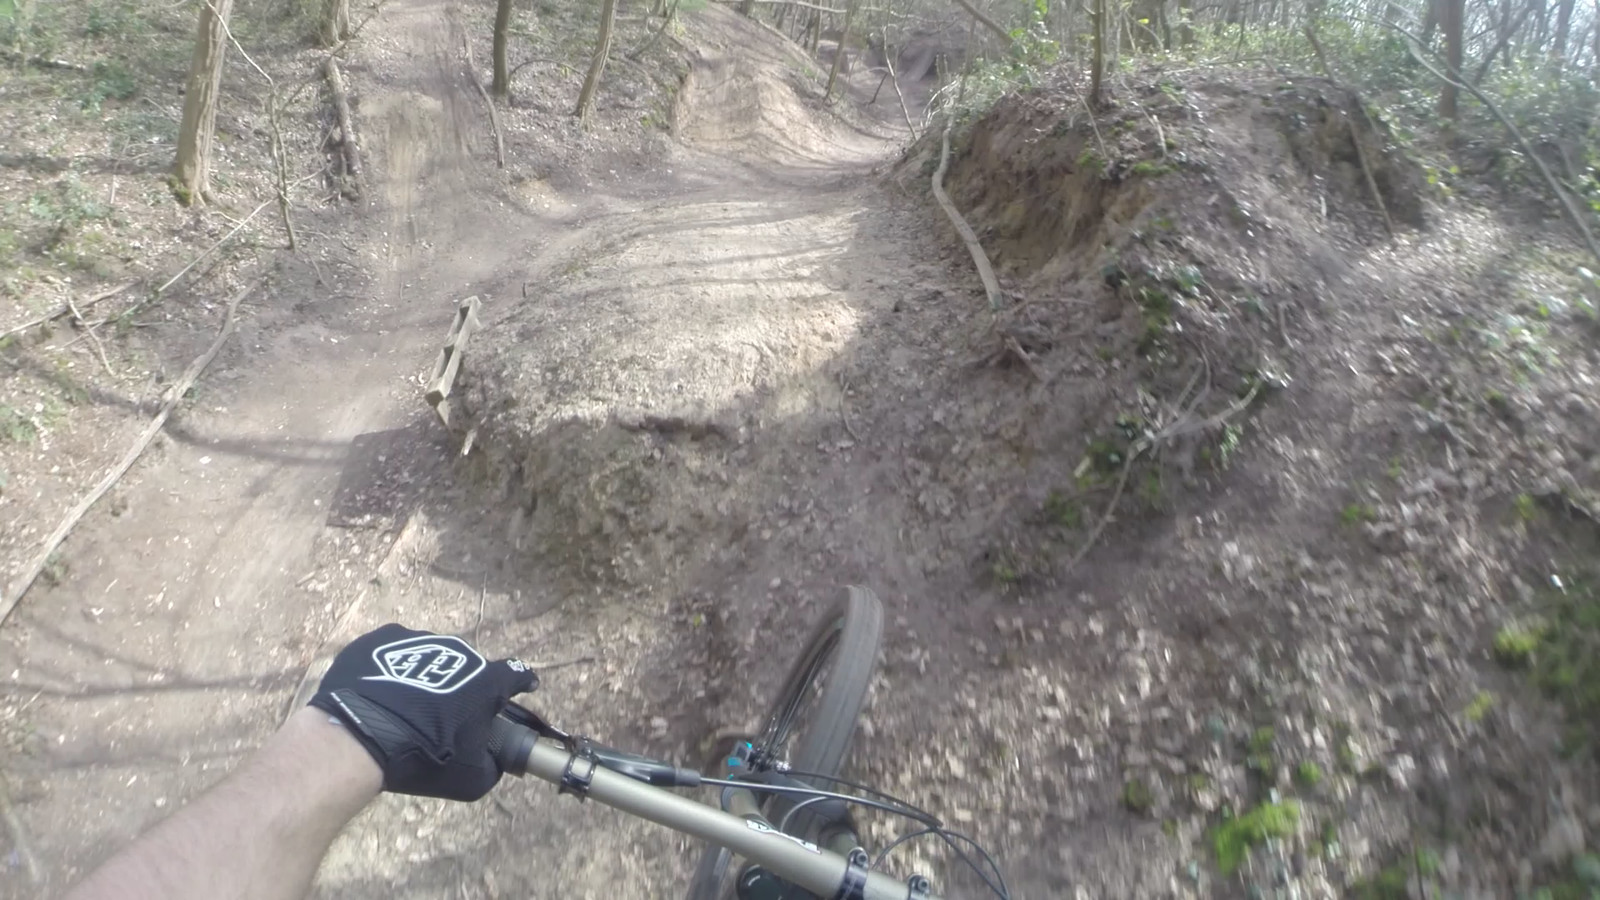 fr2 - dennis.leidelmeijer - Mountain Biking Pictures - Vital MTB